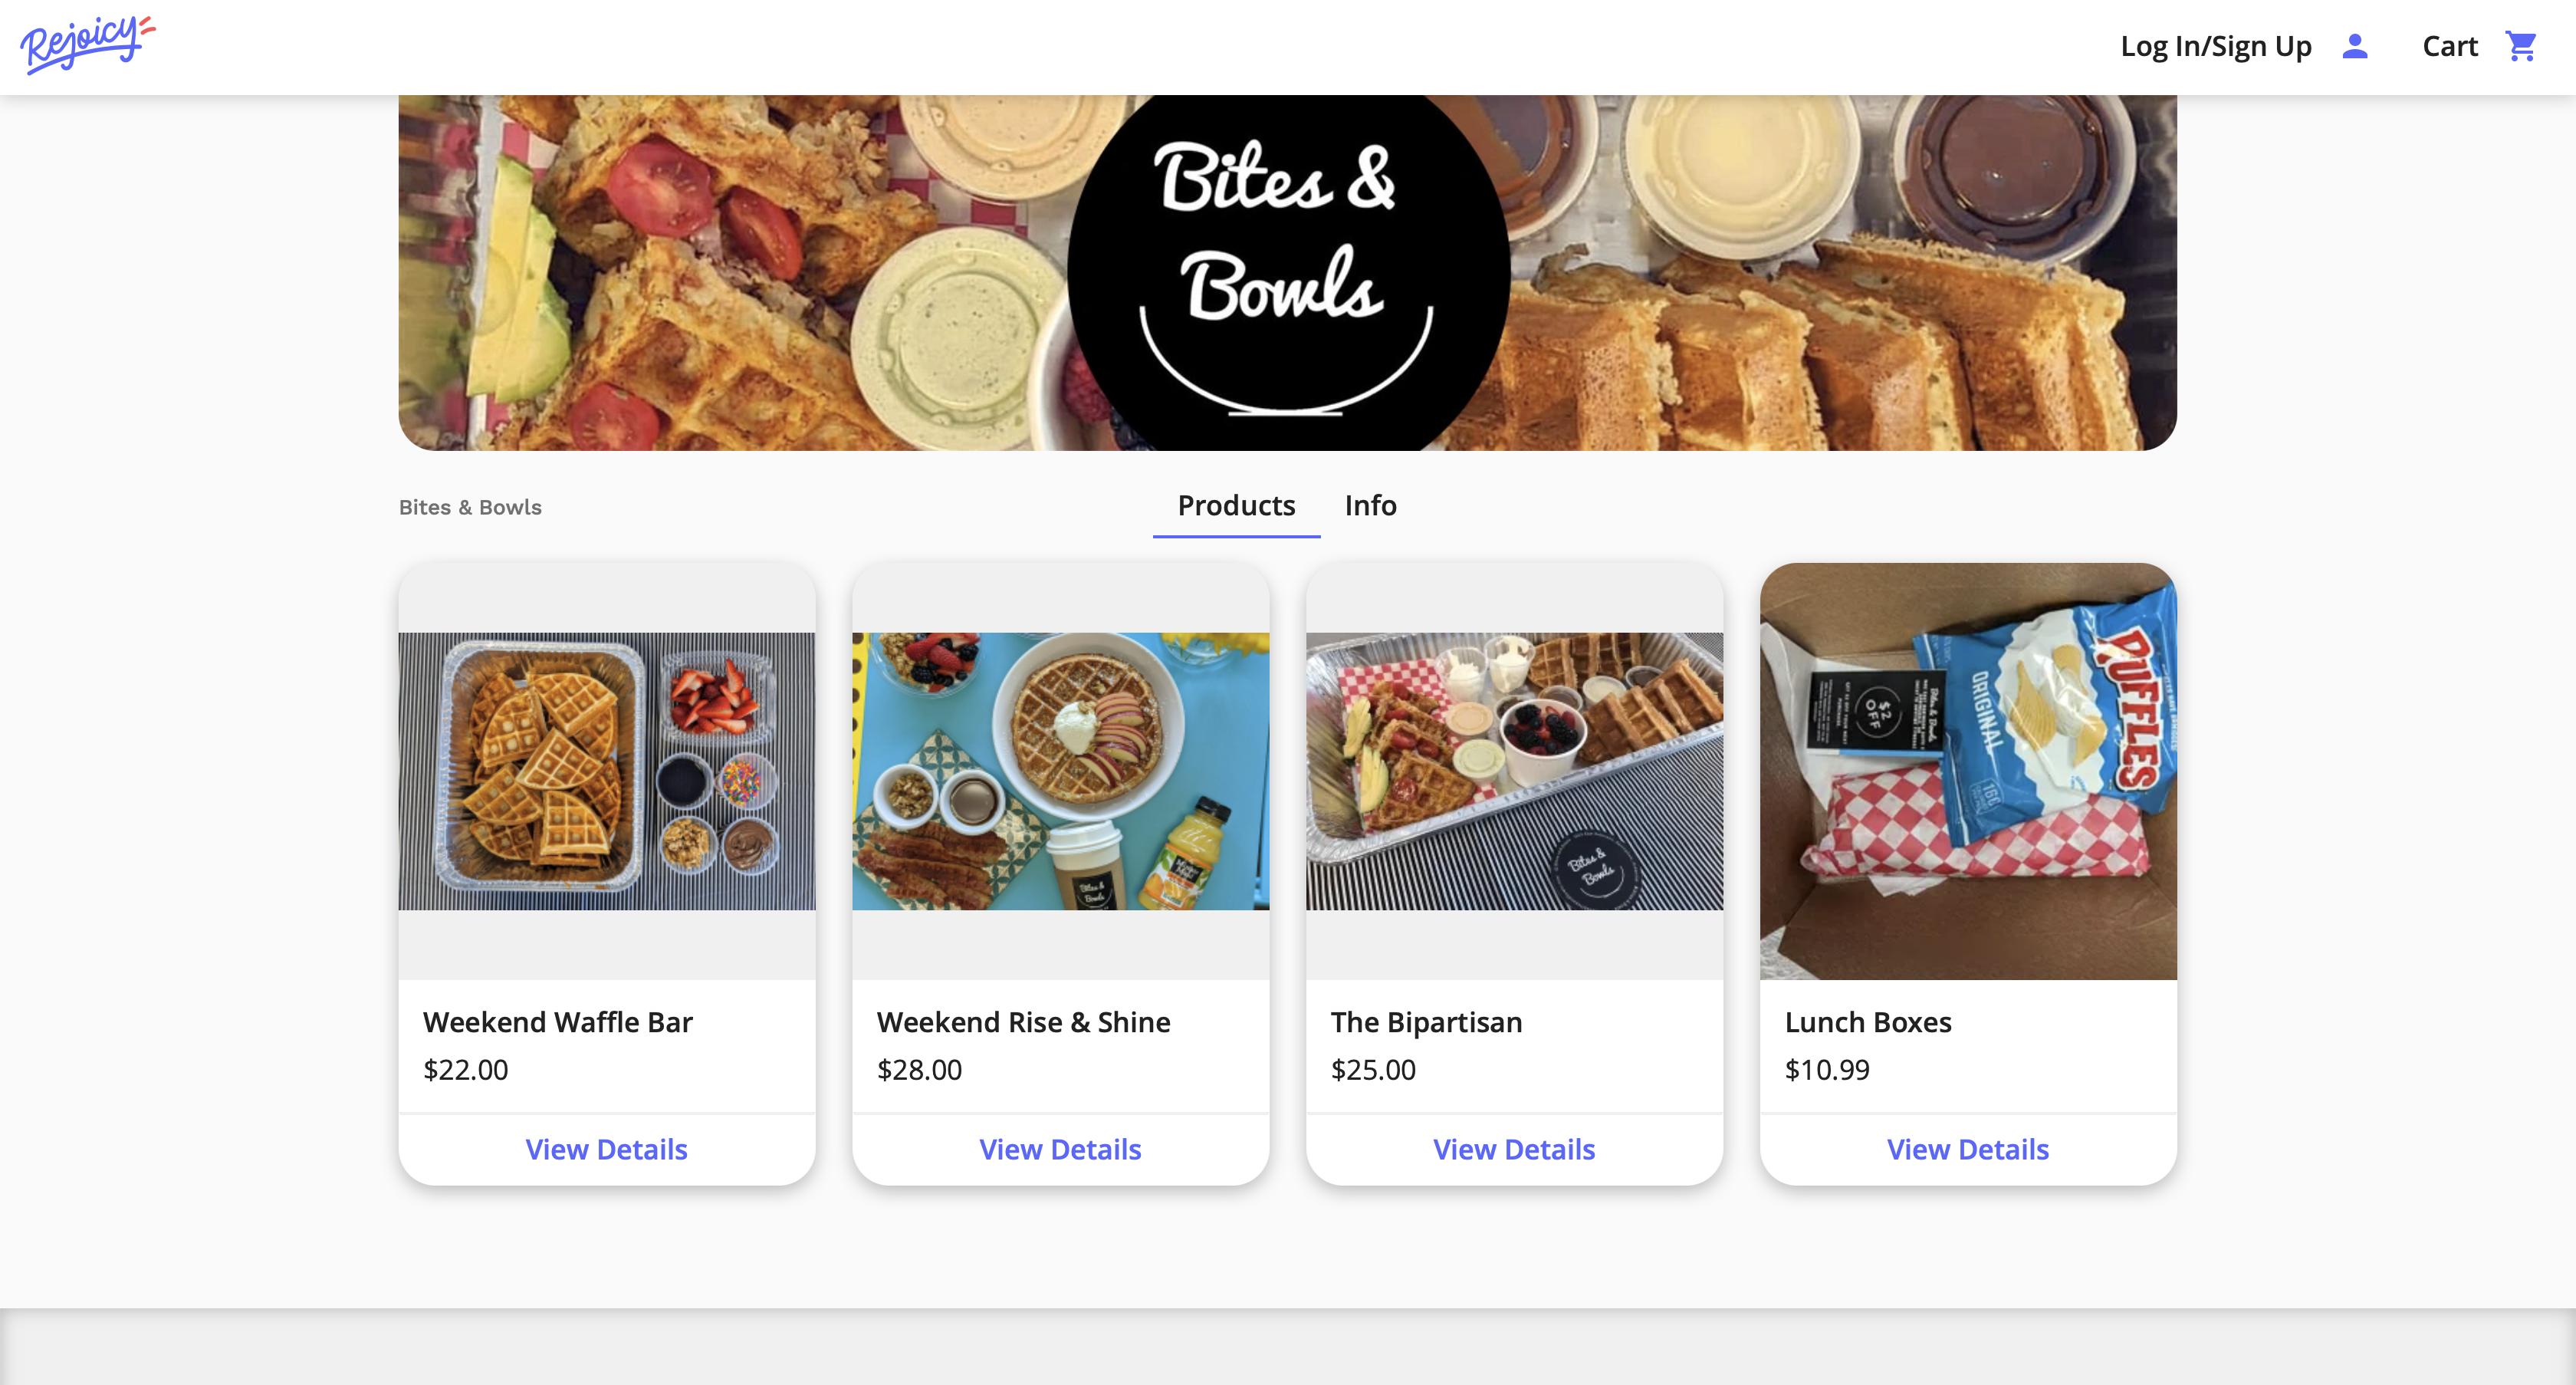 Screenshot of Bites & Bowlsl shop on Rejoicy